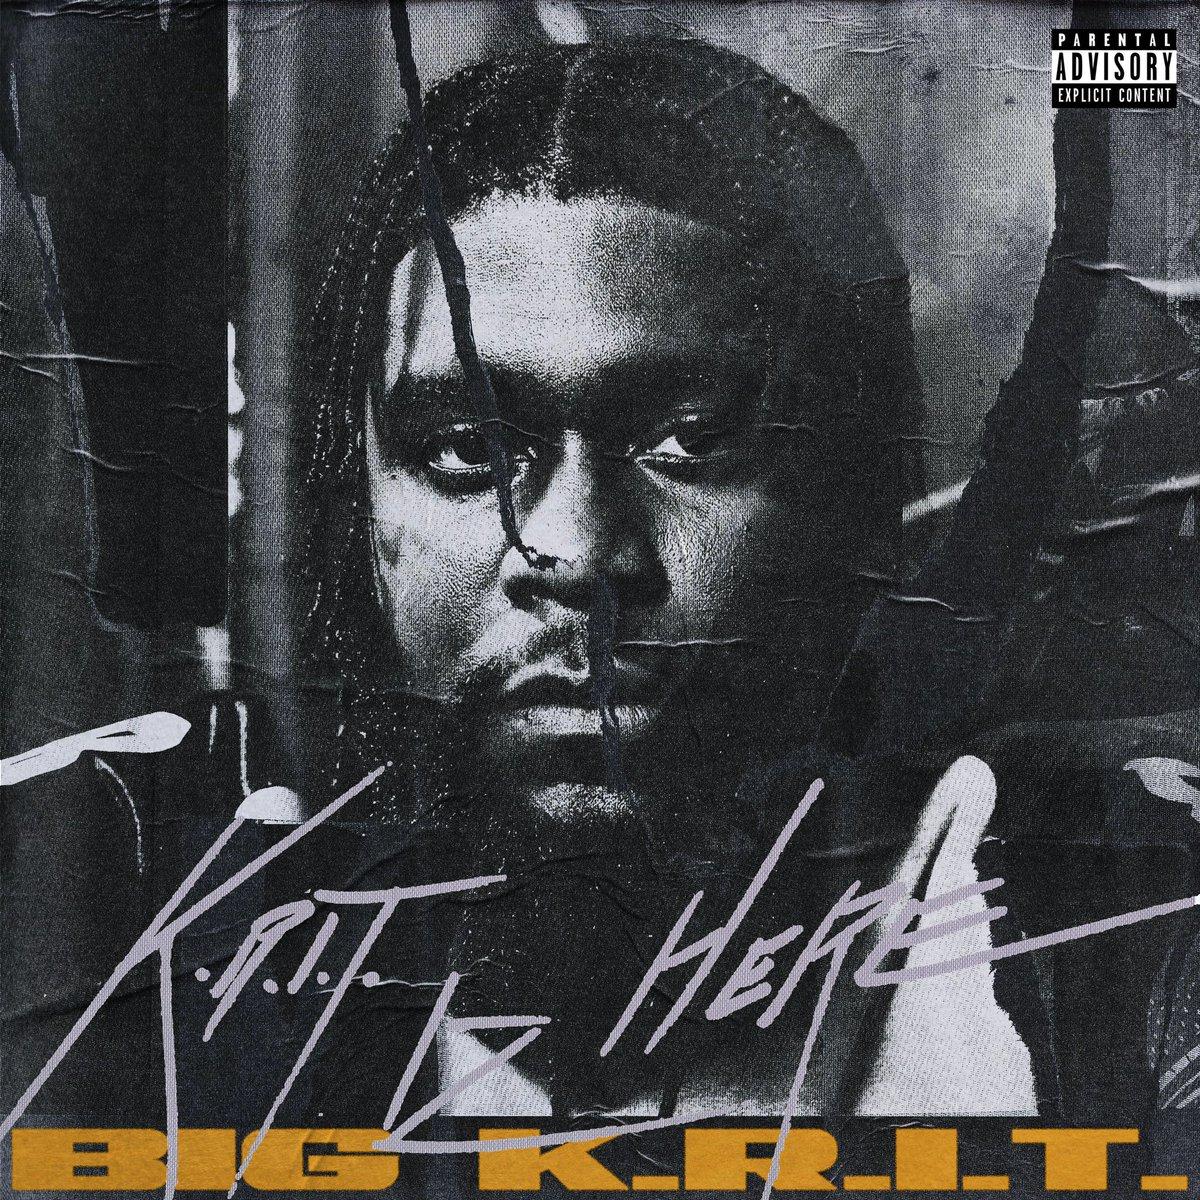 Big K.R.I.T. – 'K.R.I.T. Iz Here' (Stream)